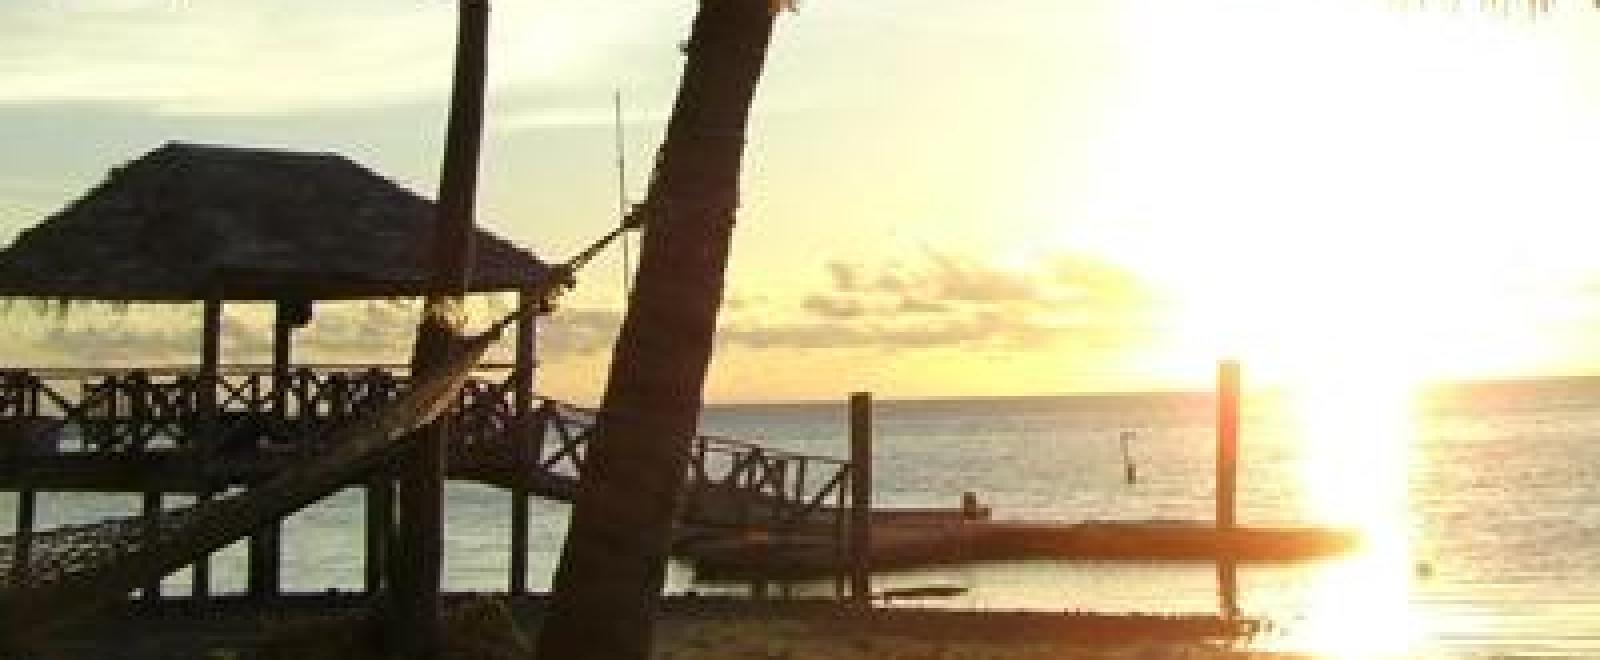 Erfahrungsberichte: Kinderbetreuung auf Fidschi-Inseln - Renate B